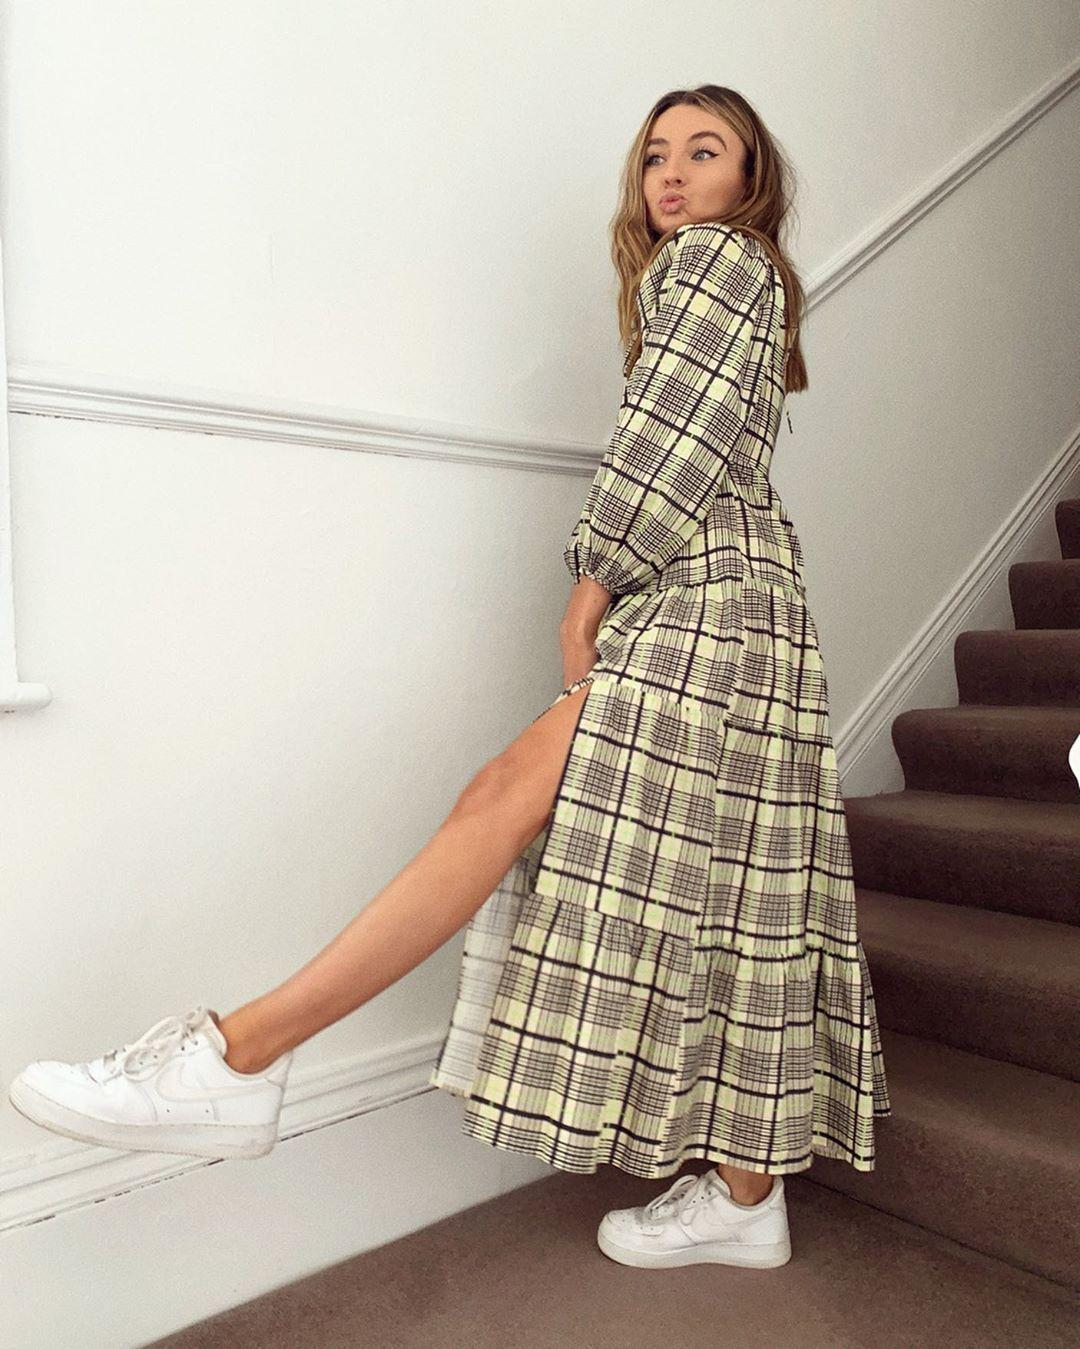 Chloe-Hayward-Wallpapers-Insta-Fit-Bio-9